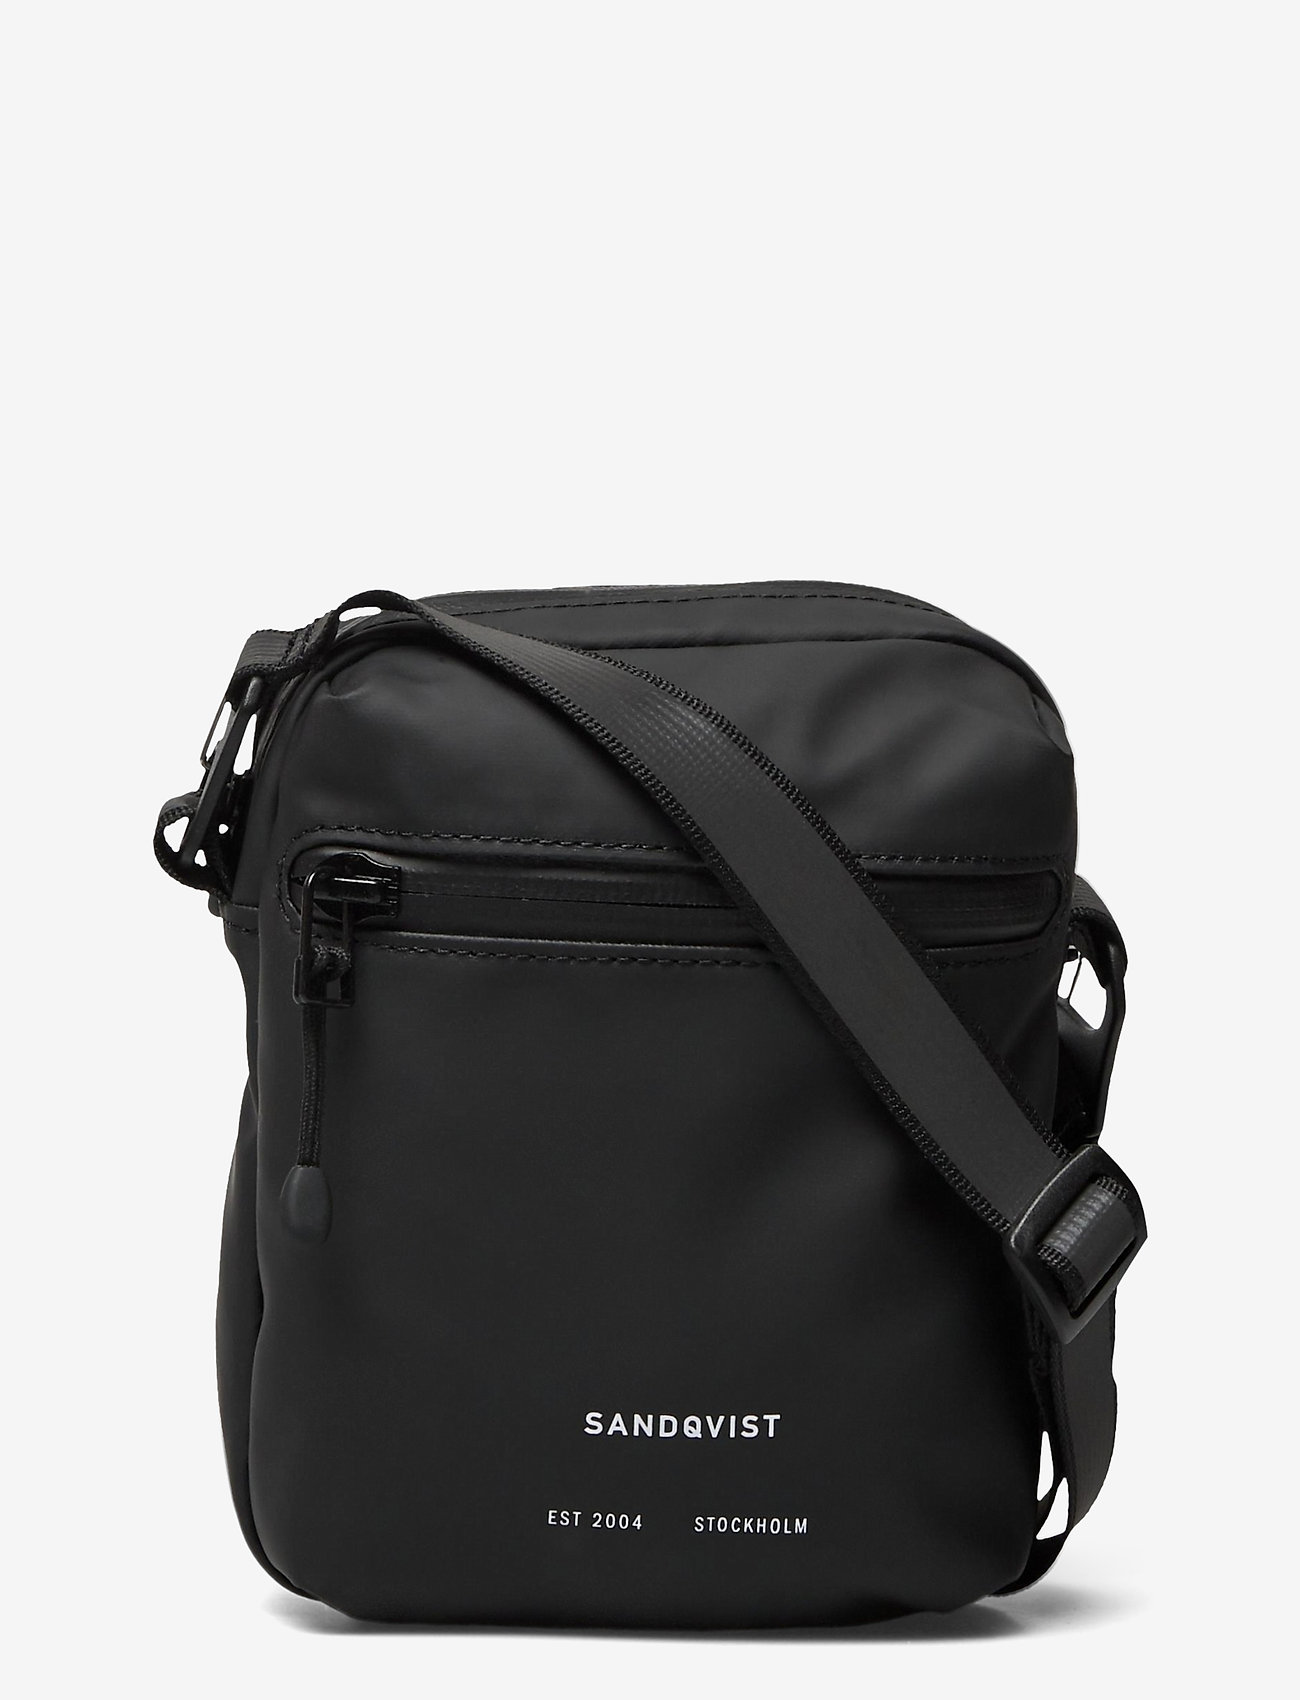 SANDQVIST - POE - tassen - black - 1